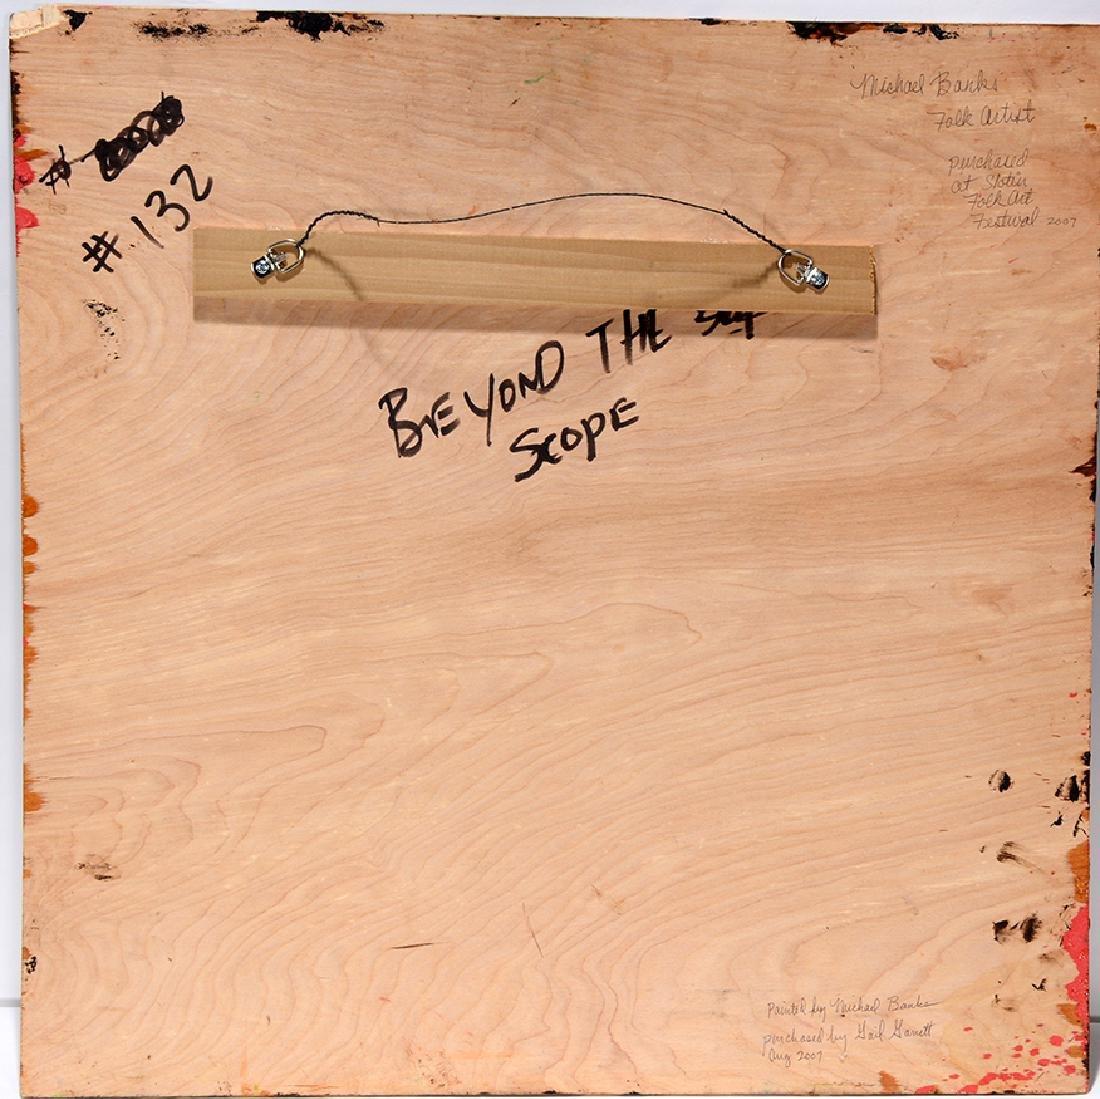 Michael Banks. Beyond The Scope. - 2